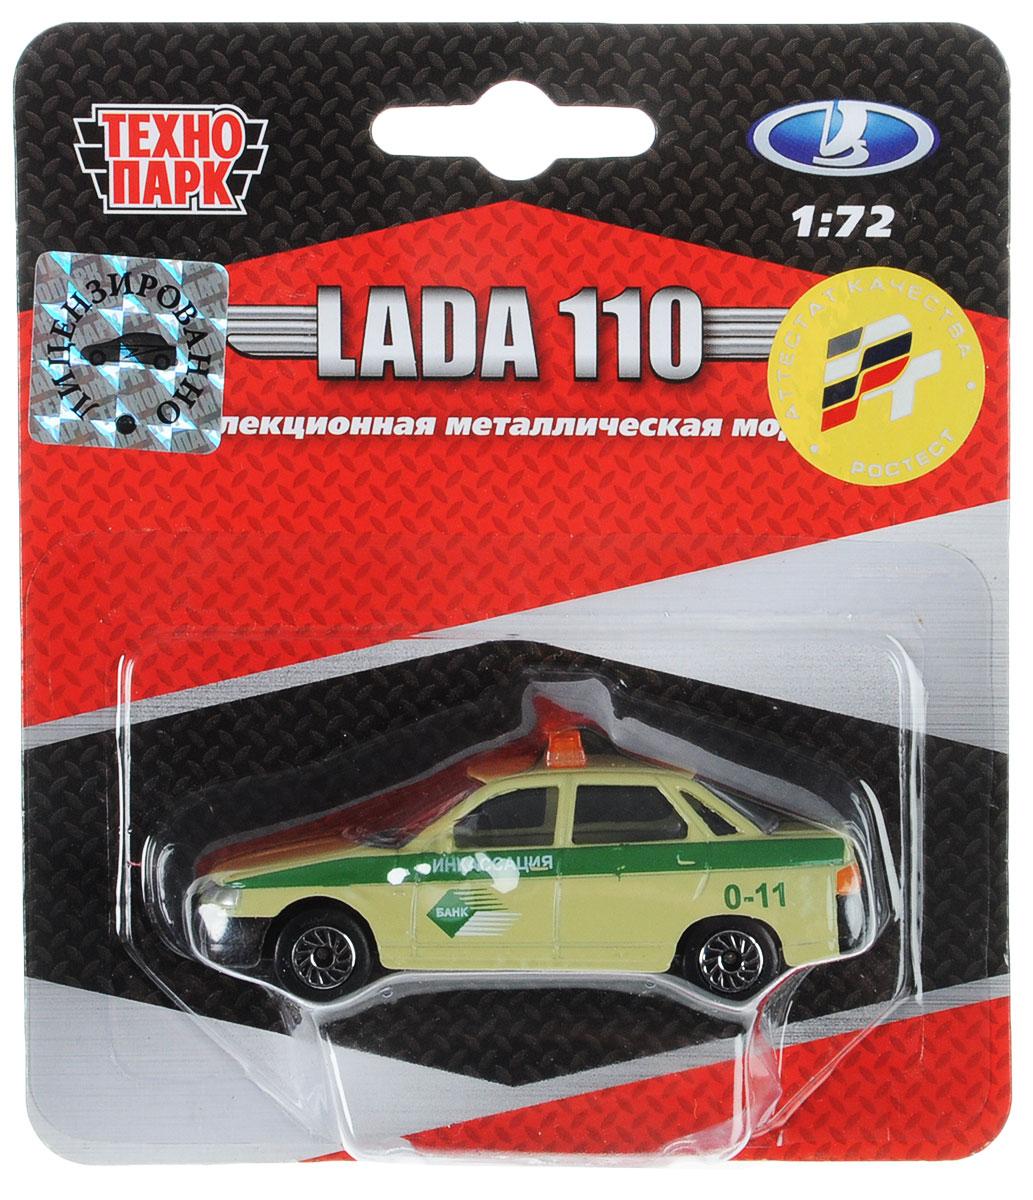 ТехноПарк Автомобиль Лада 110 Инкассация